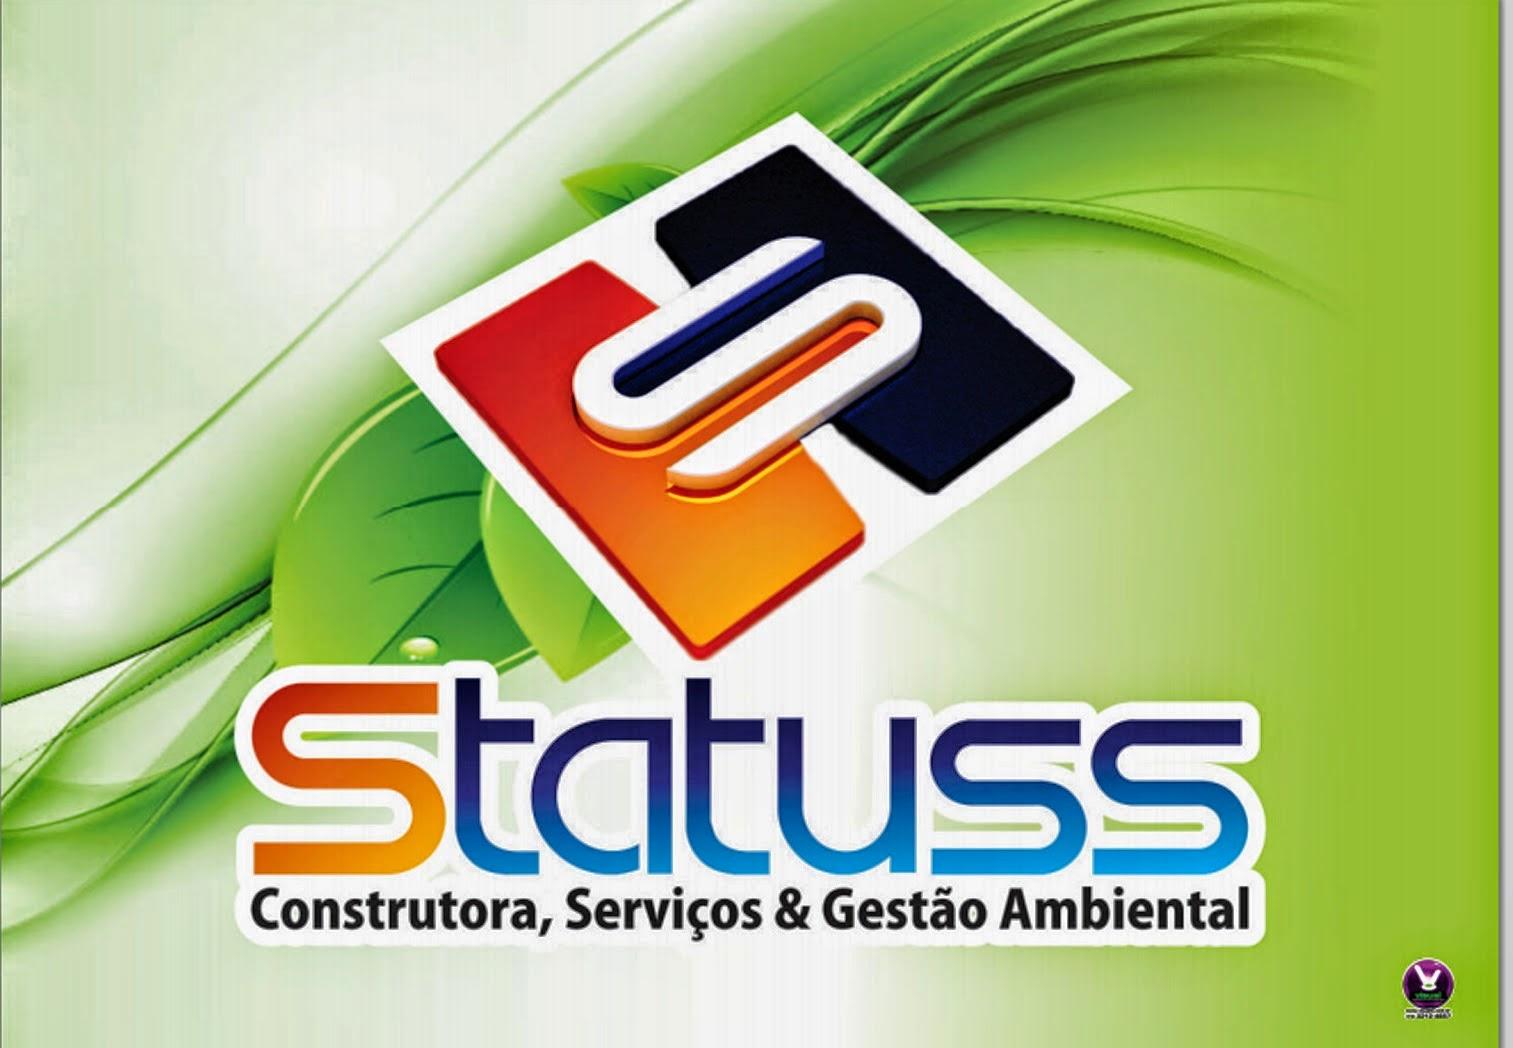 STATUSS CONSTRUTORA